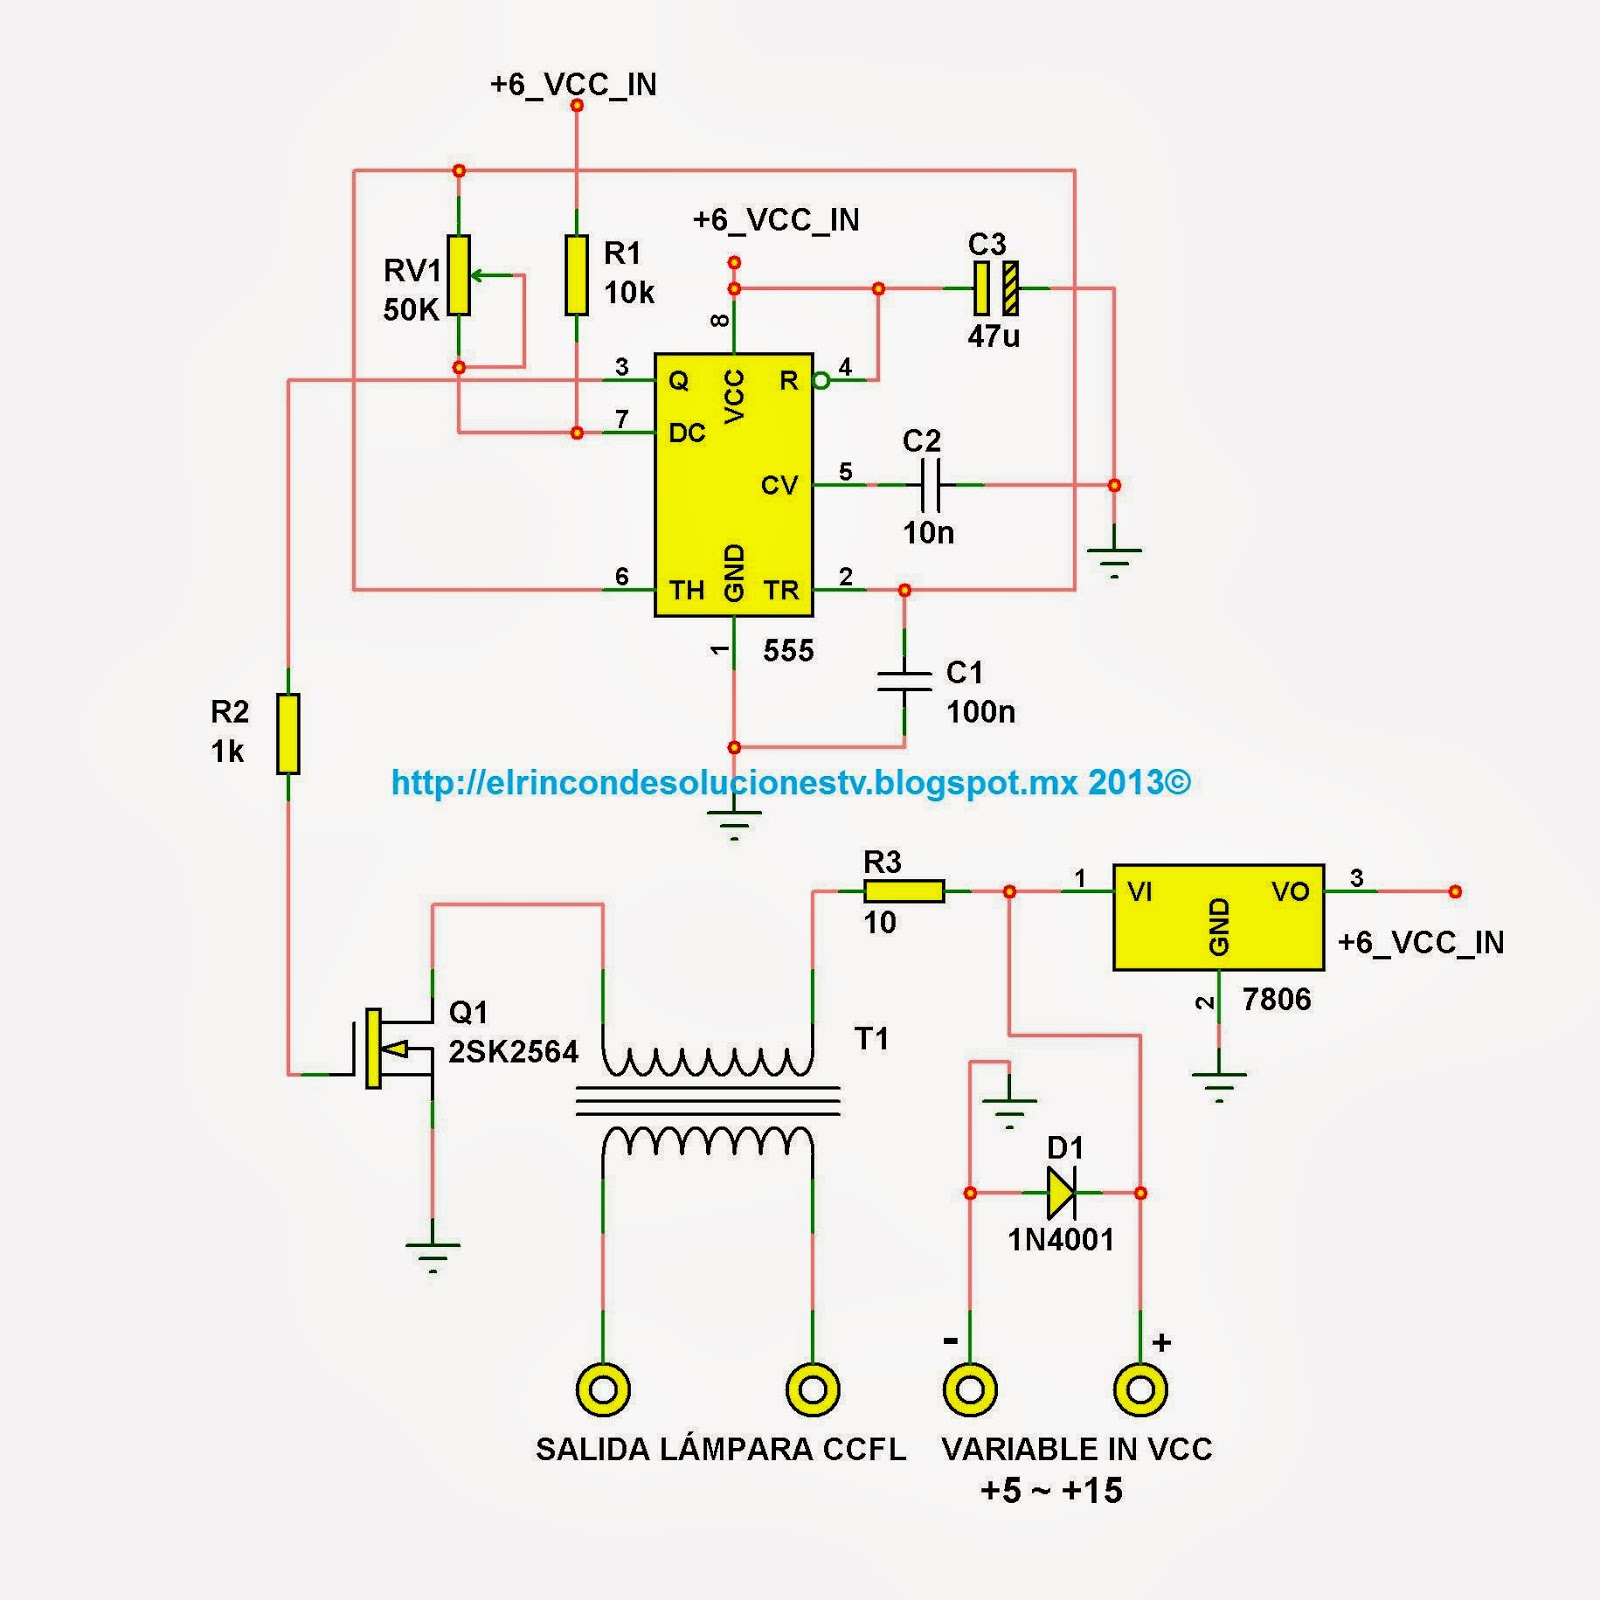 samsung refrigerator schematic diagram samsung get free power cord connector types extension cord wiring diagram [ 1600 x 1600 Pixel ]